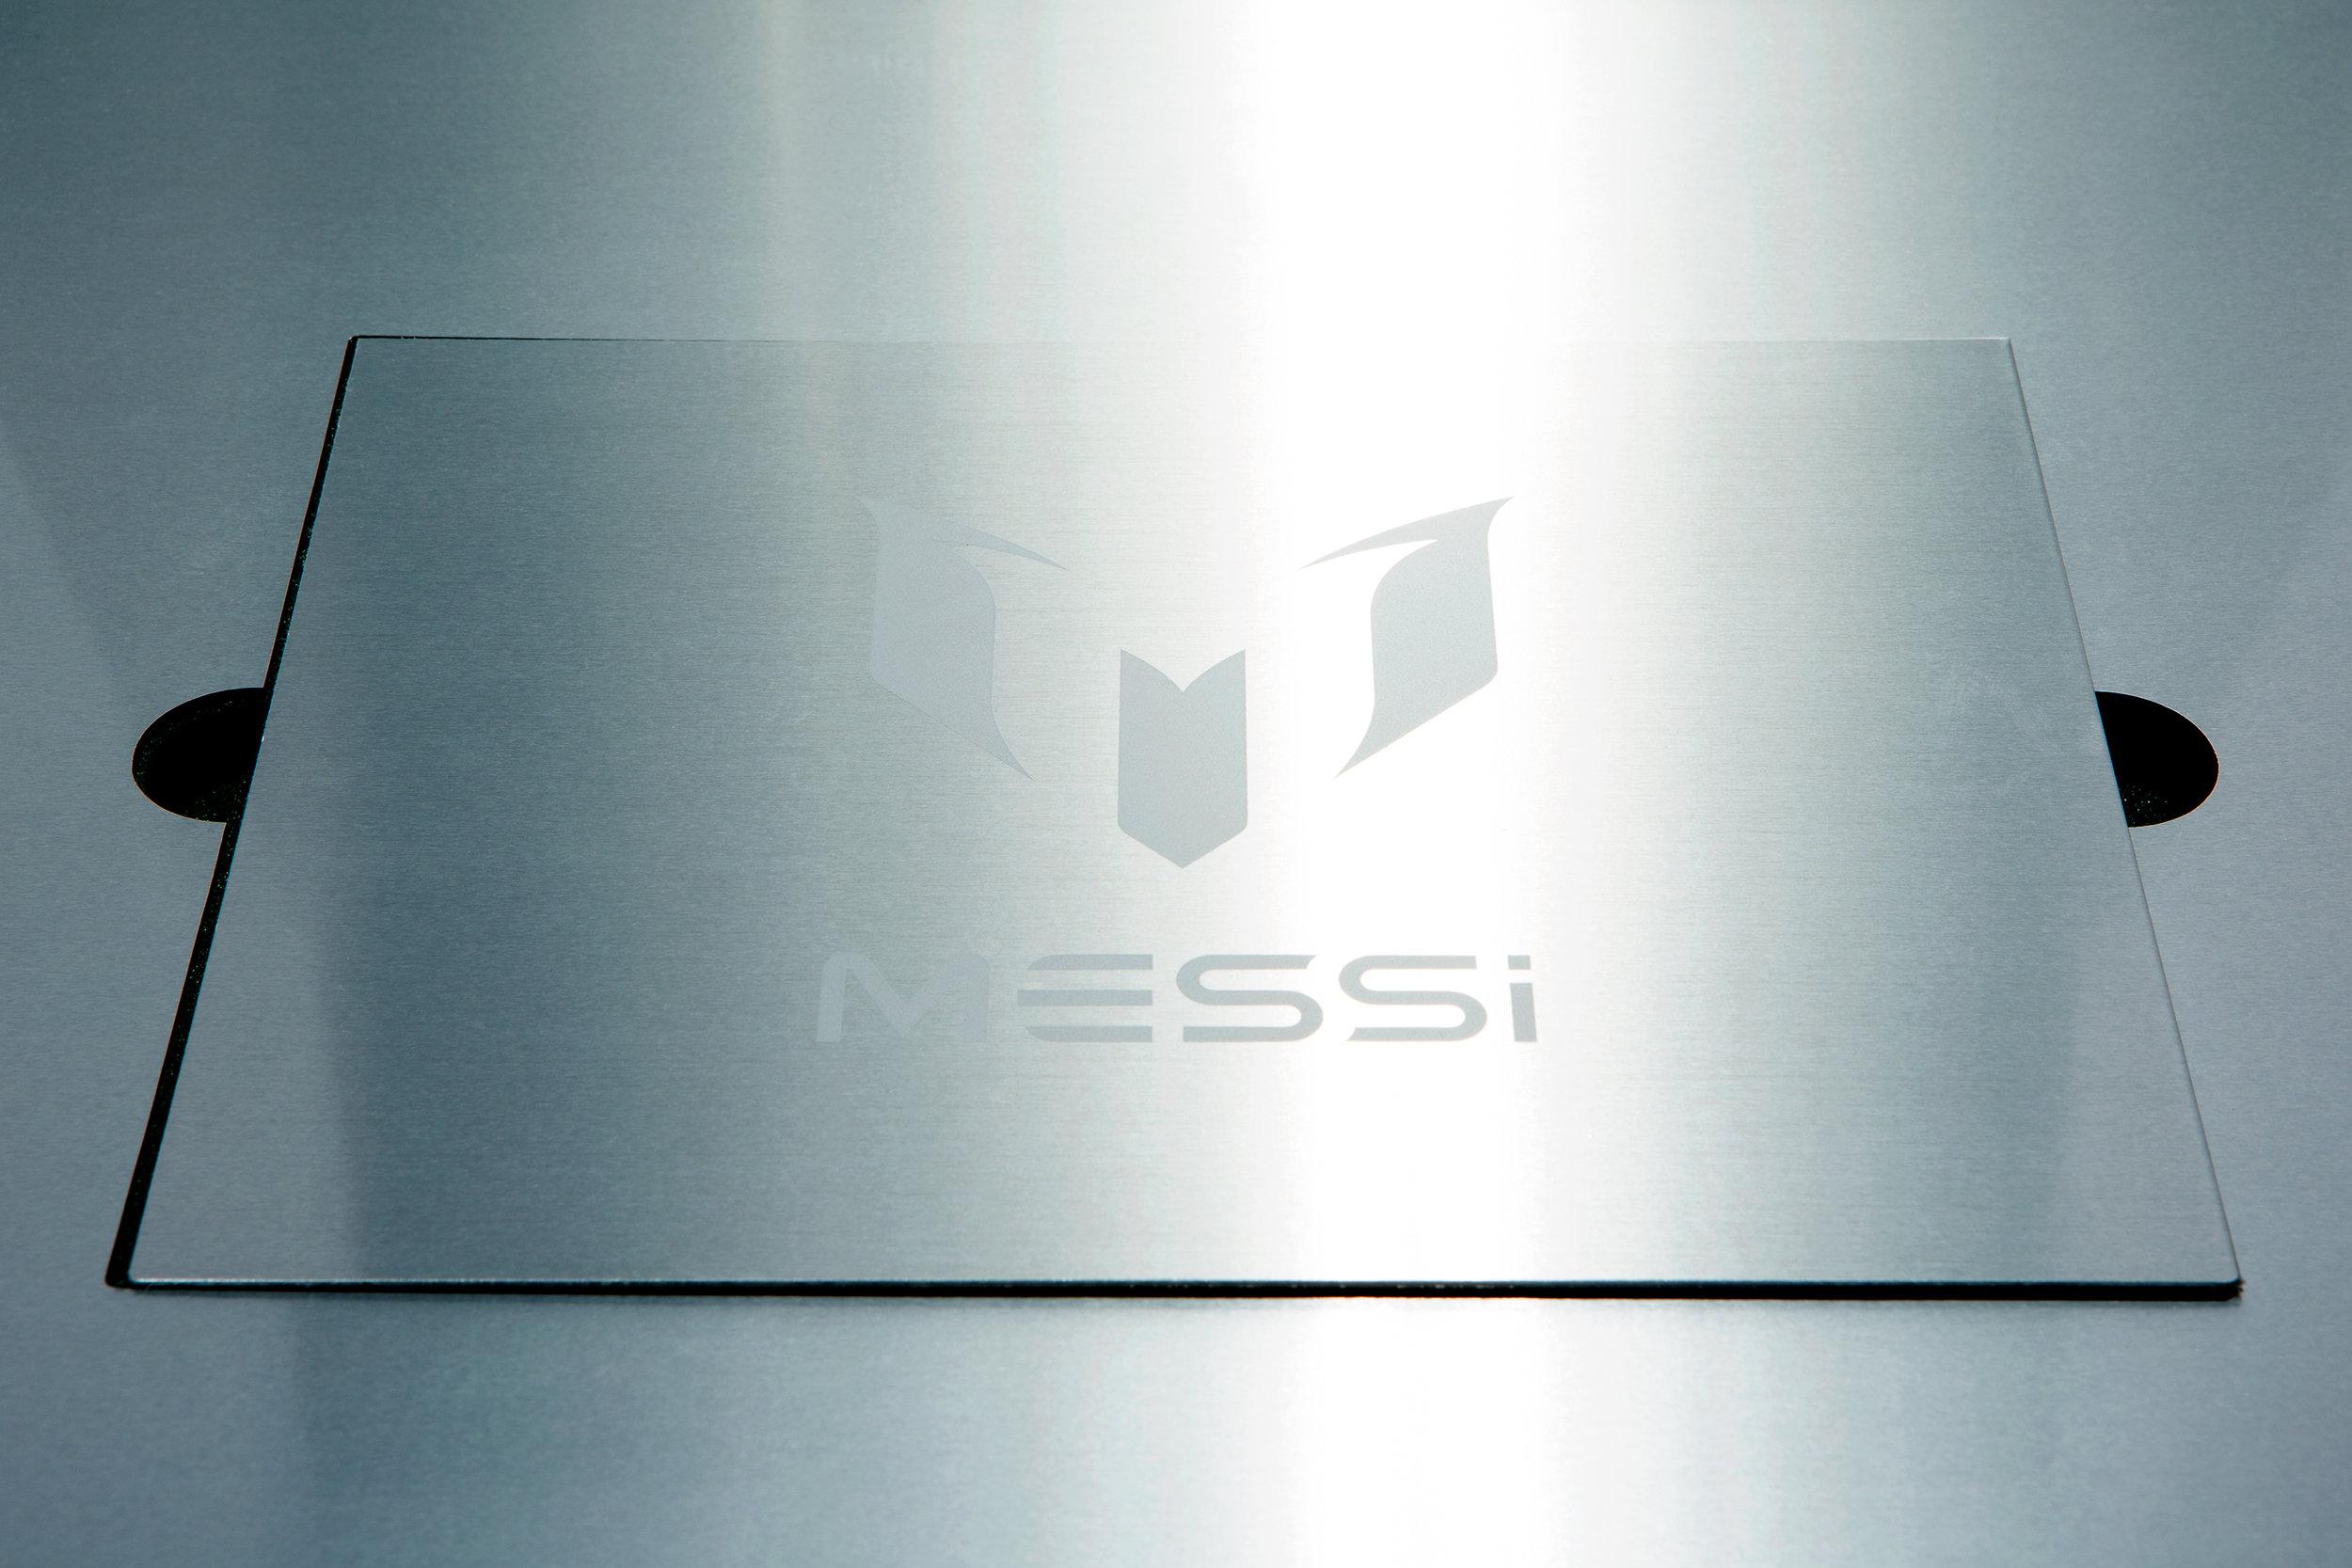 adidas_Messi_box_2.jpg